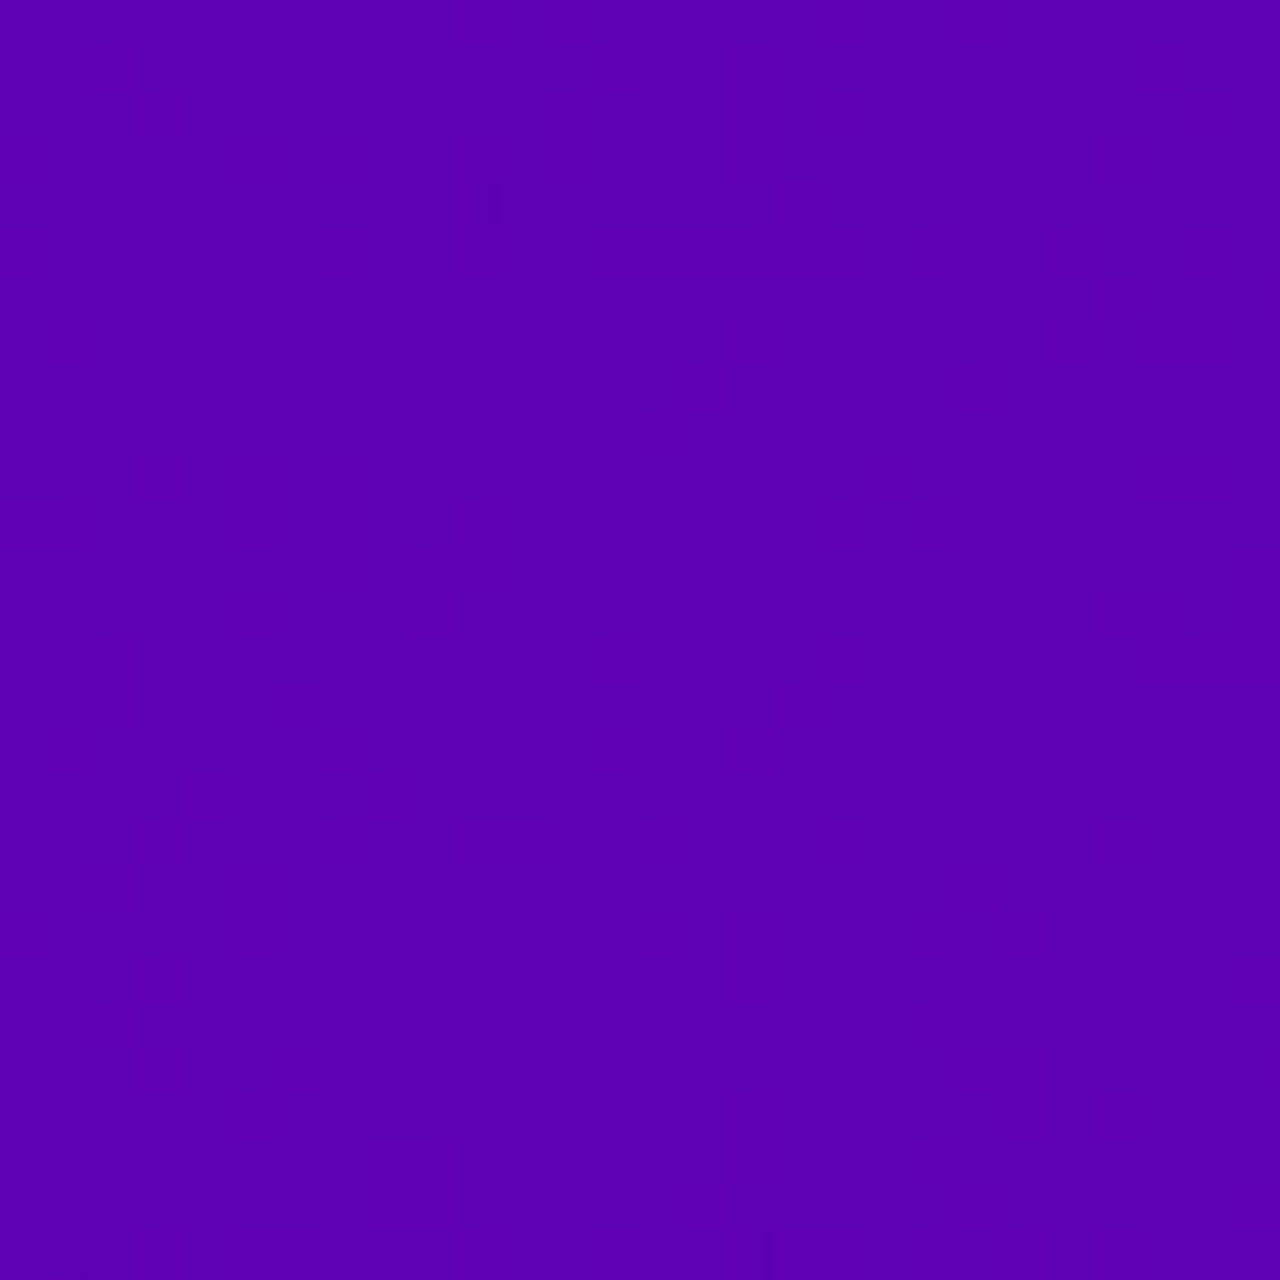 "#0357 Rosco Gels Roscolux Royal Lavender, 20x24"""